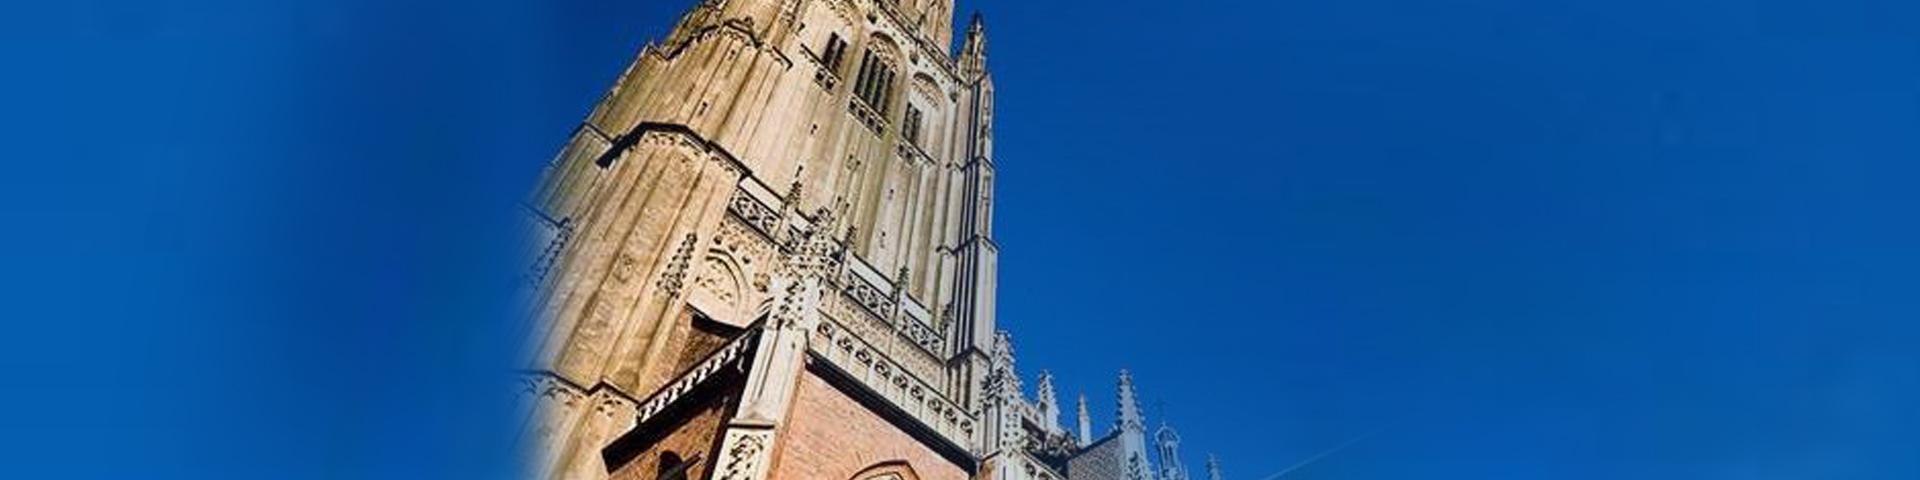 Grote- of Eusebiuskerk